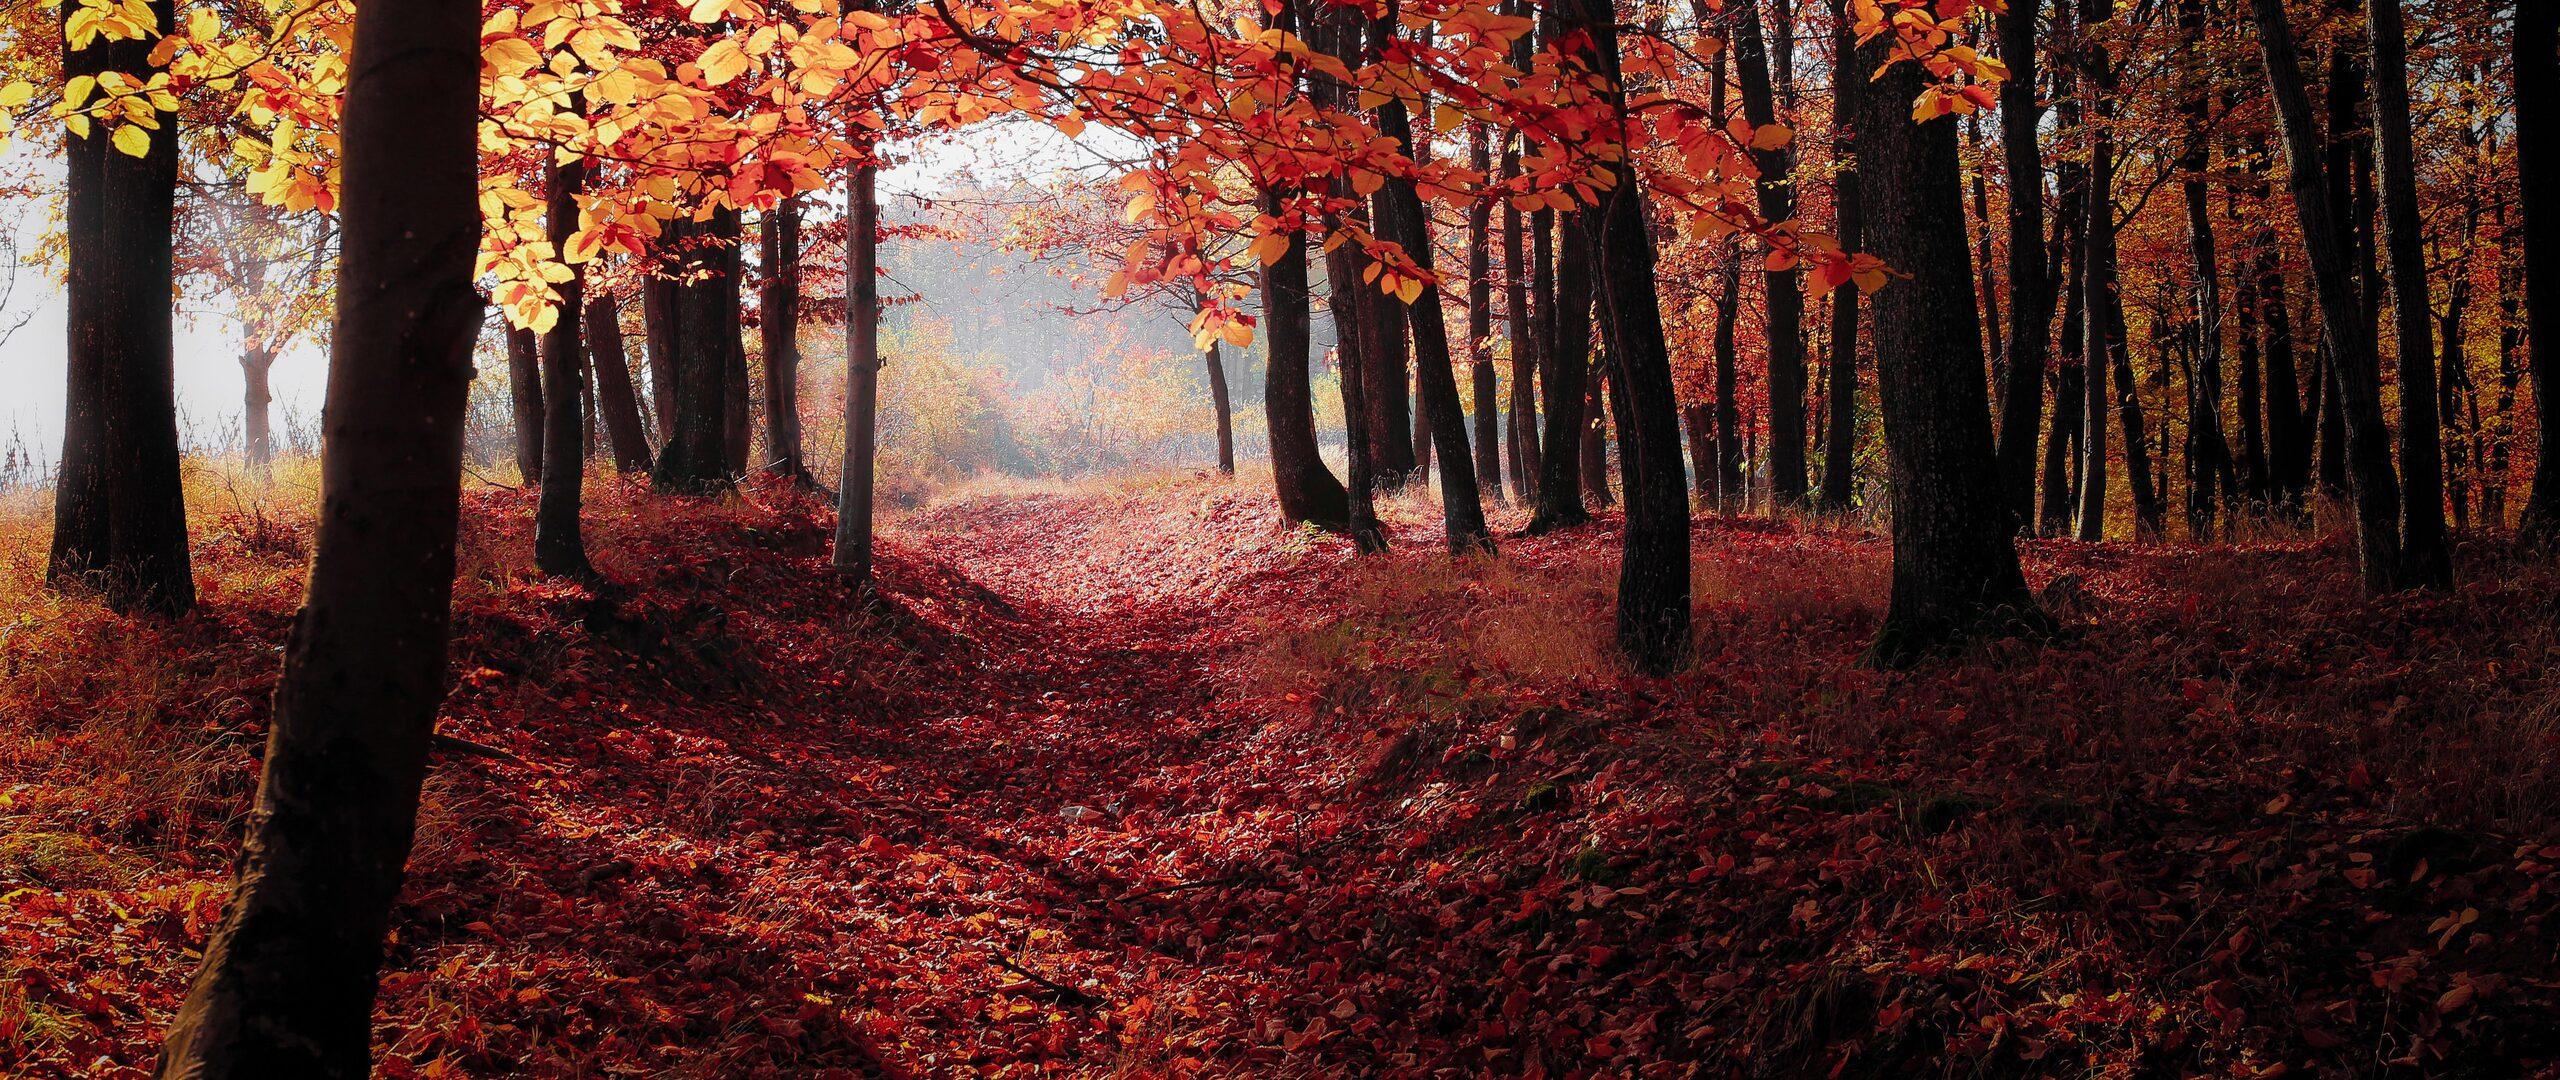 autumn-woods-trees-fall-forest-5k-uj.jpg